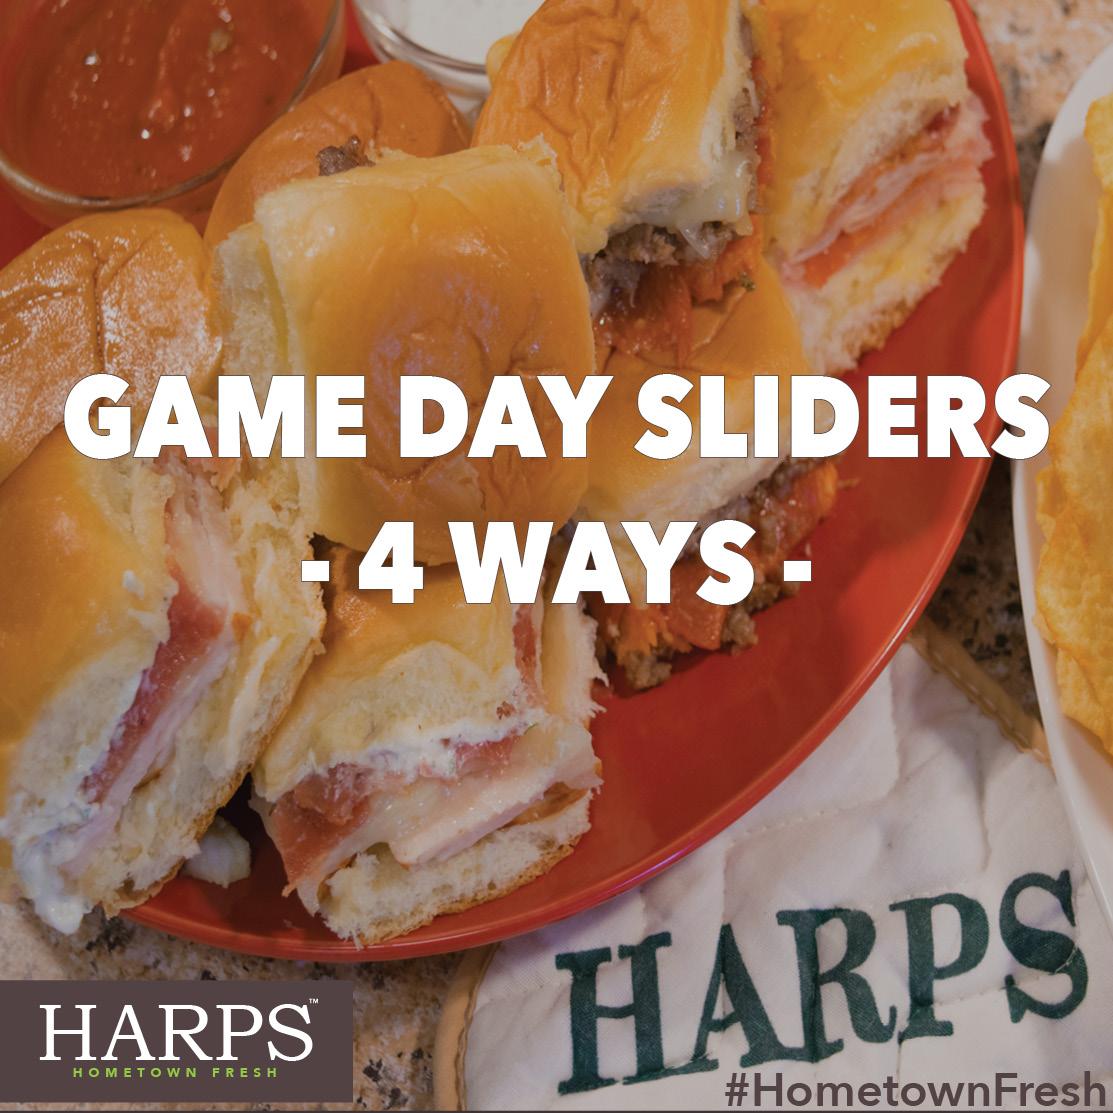 Gameday Sliders